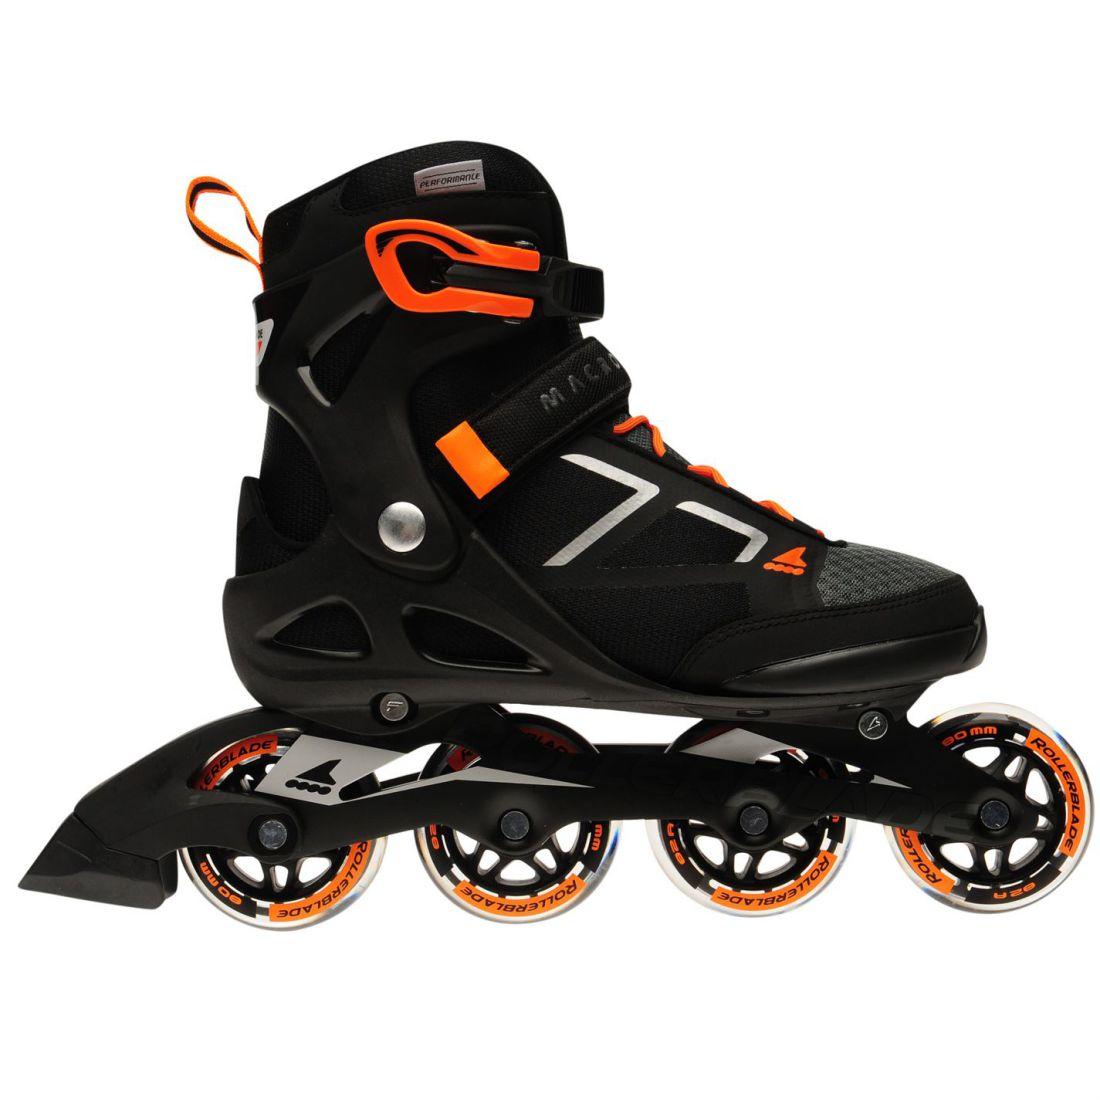 c9476dc7839 Rollerblade Mens Macro80 Skates Inline